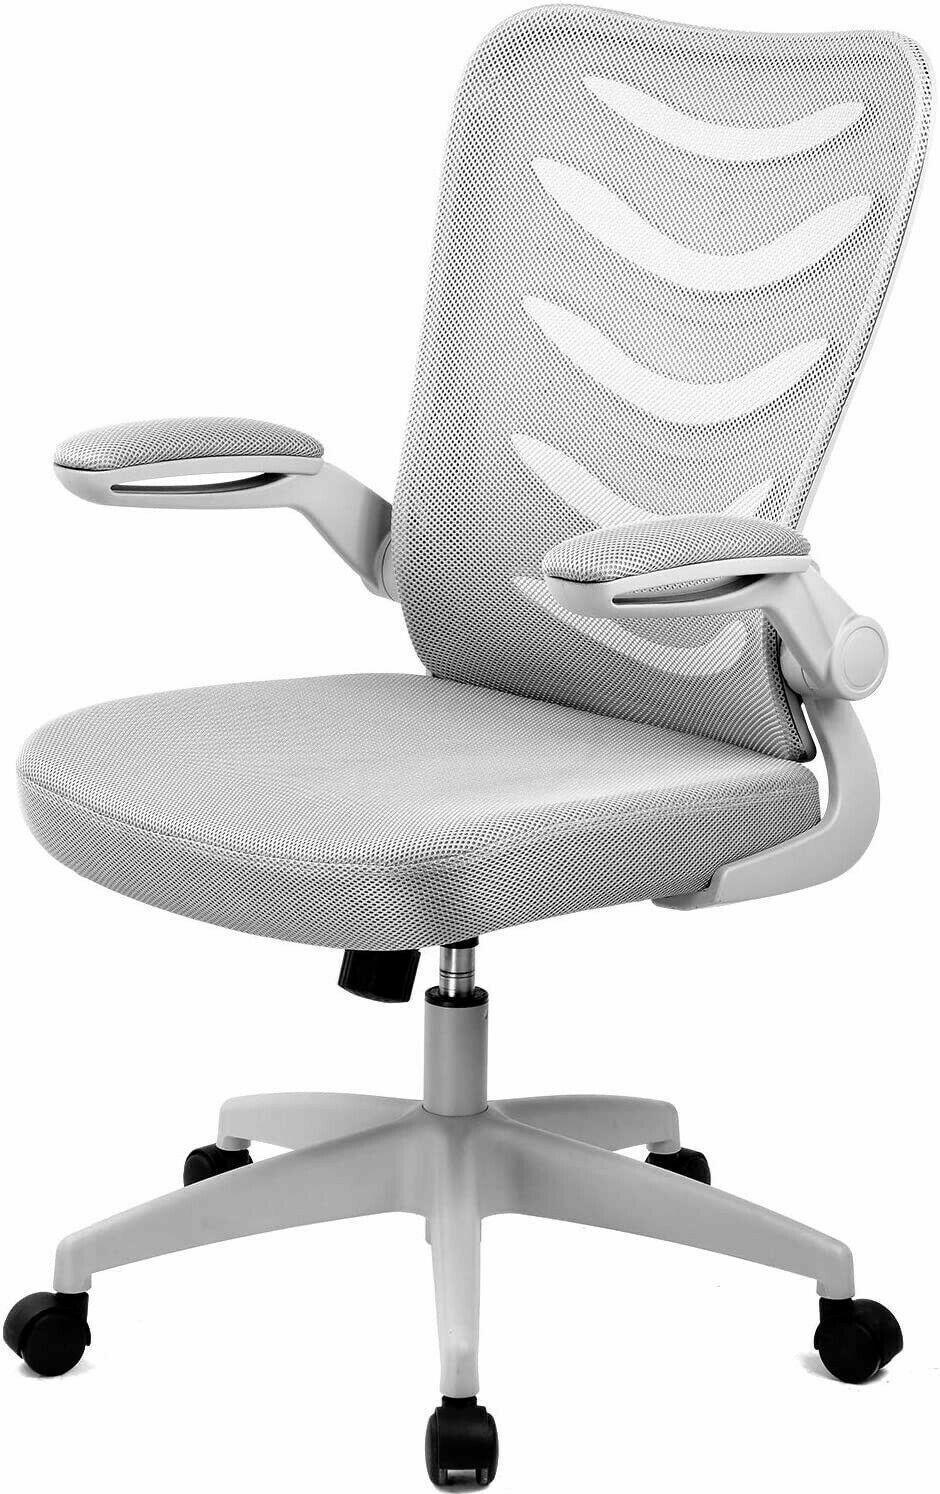 COMHOMA Bürostuhl Schreibtischstuhl Ergonomischer Drehstuhl Grau